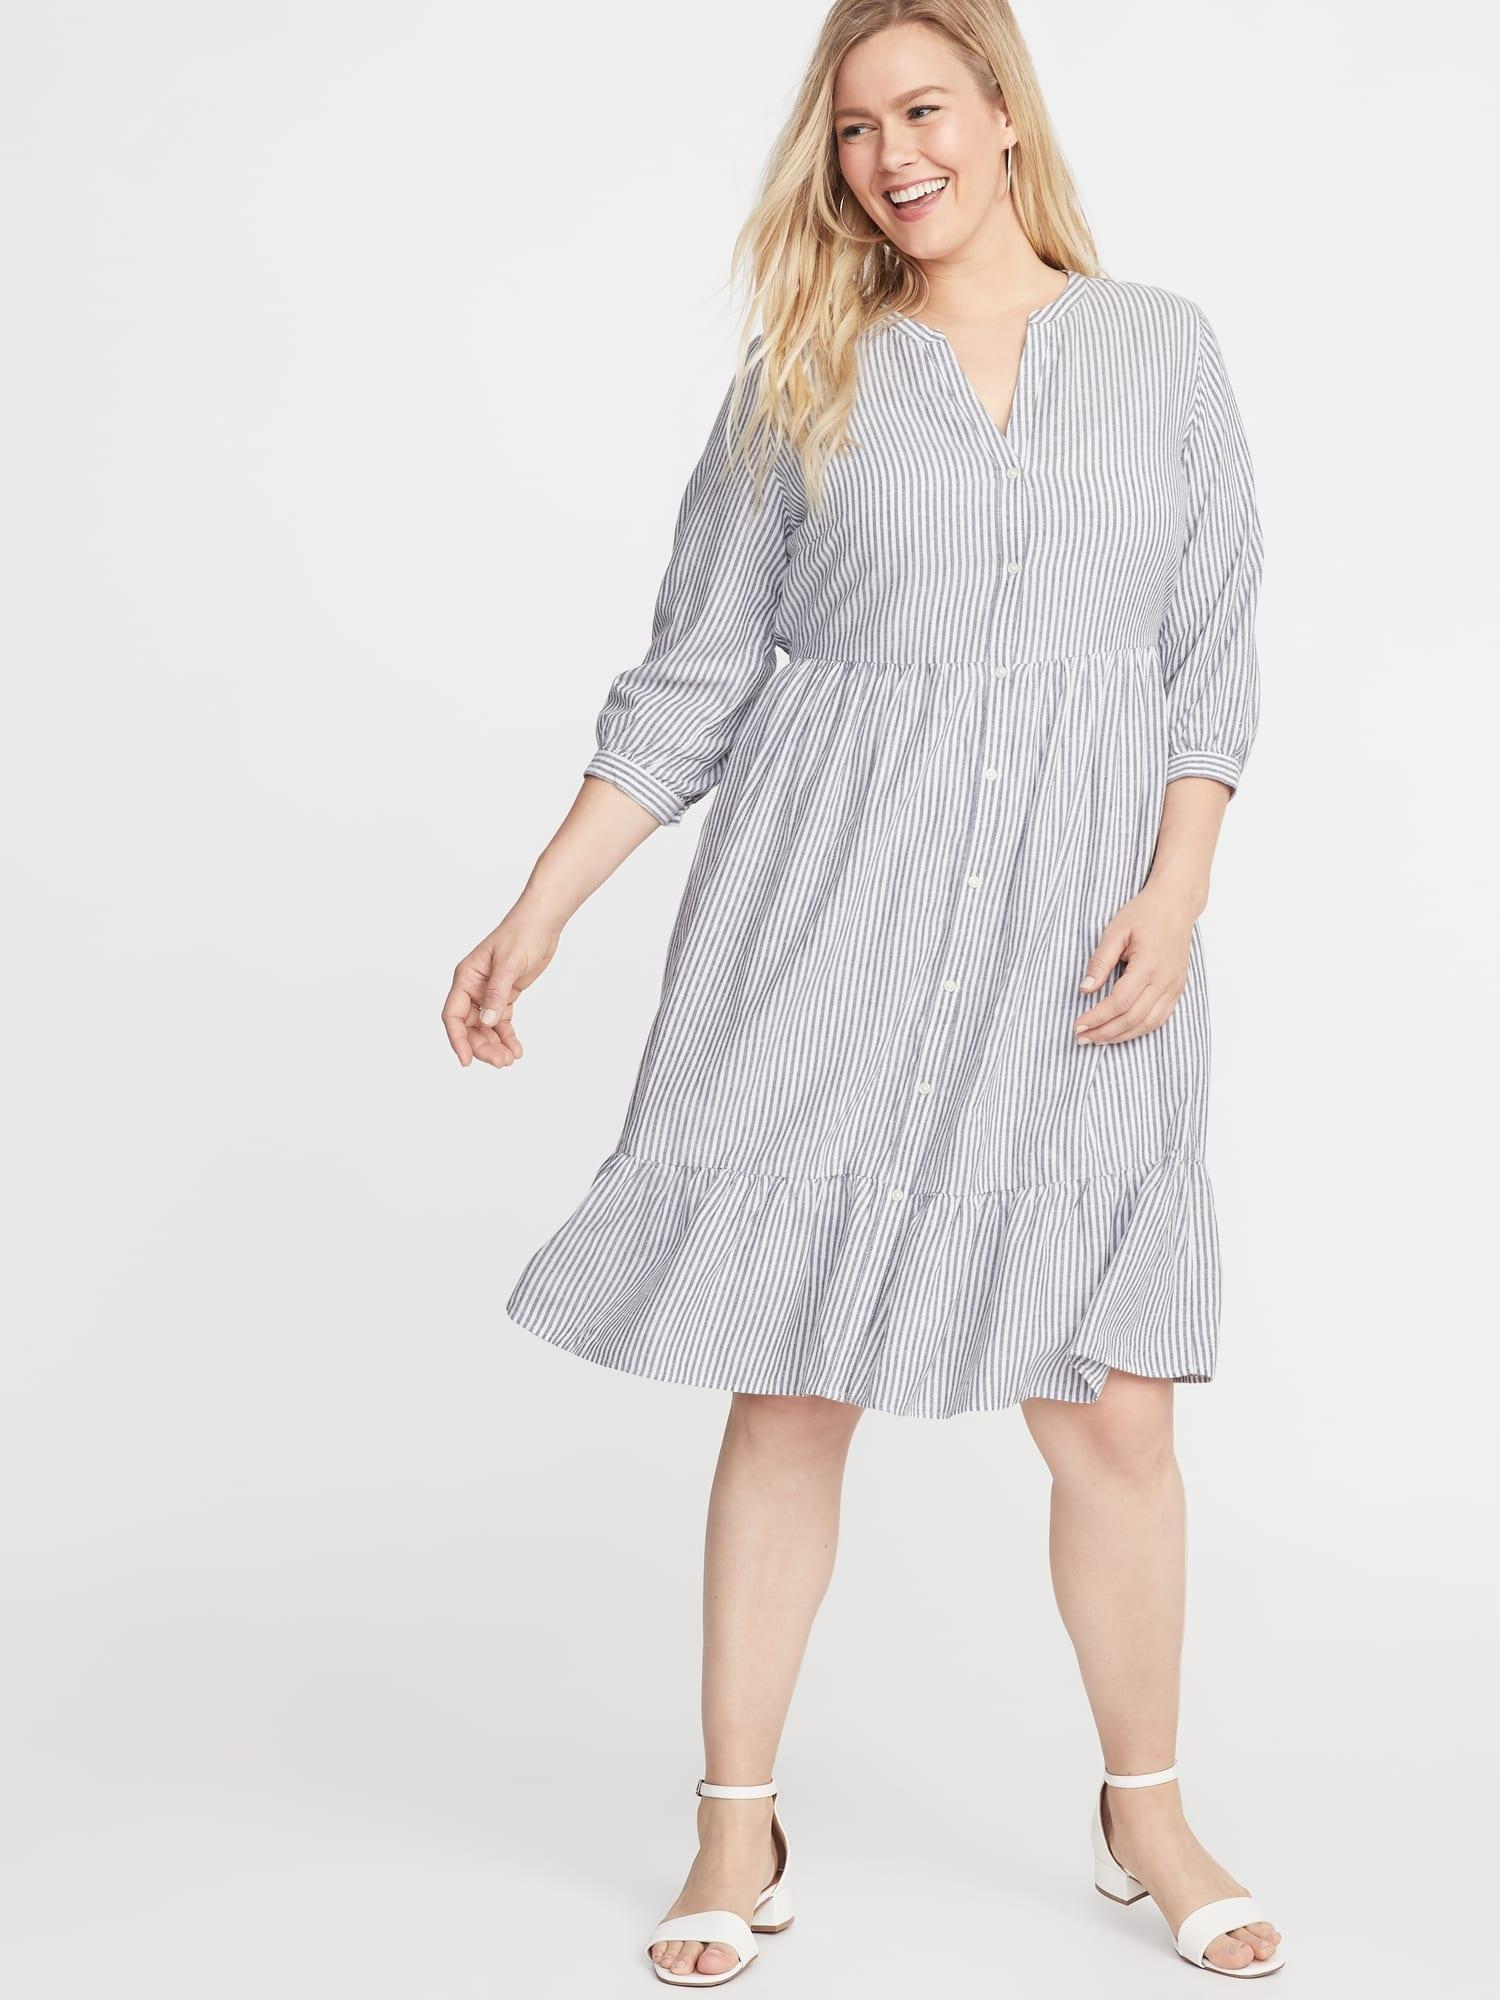 Waist-defined Plus-size Striped No-peek Shirt Dress